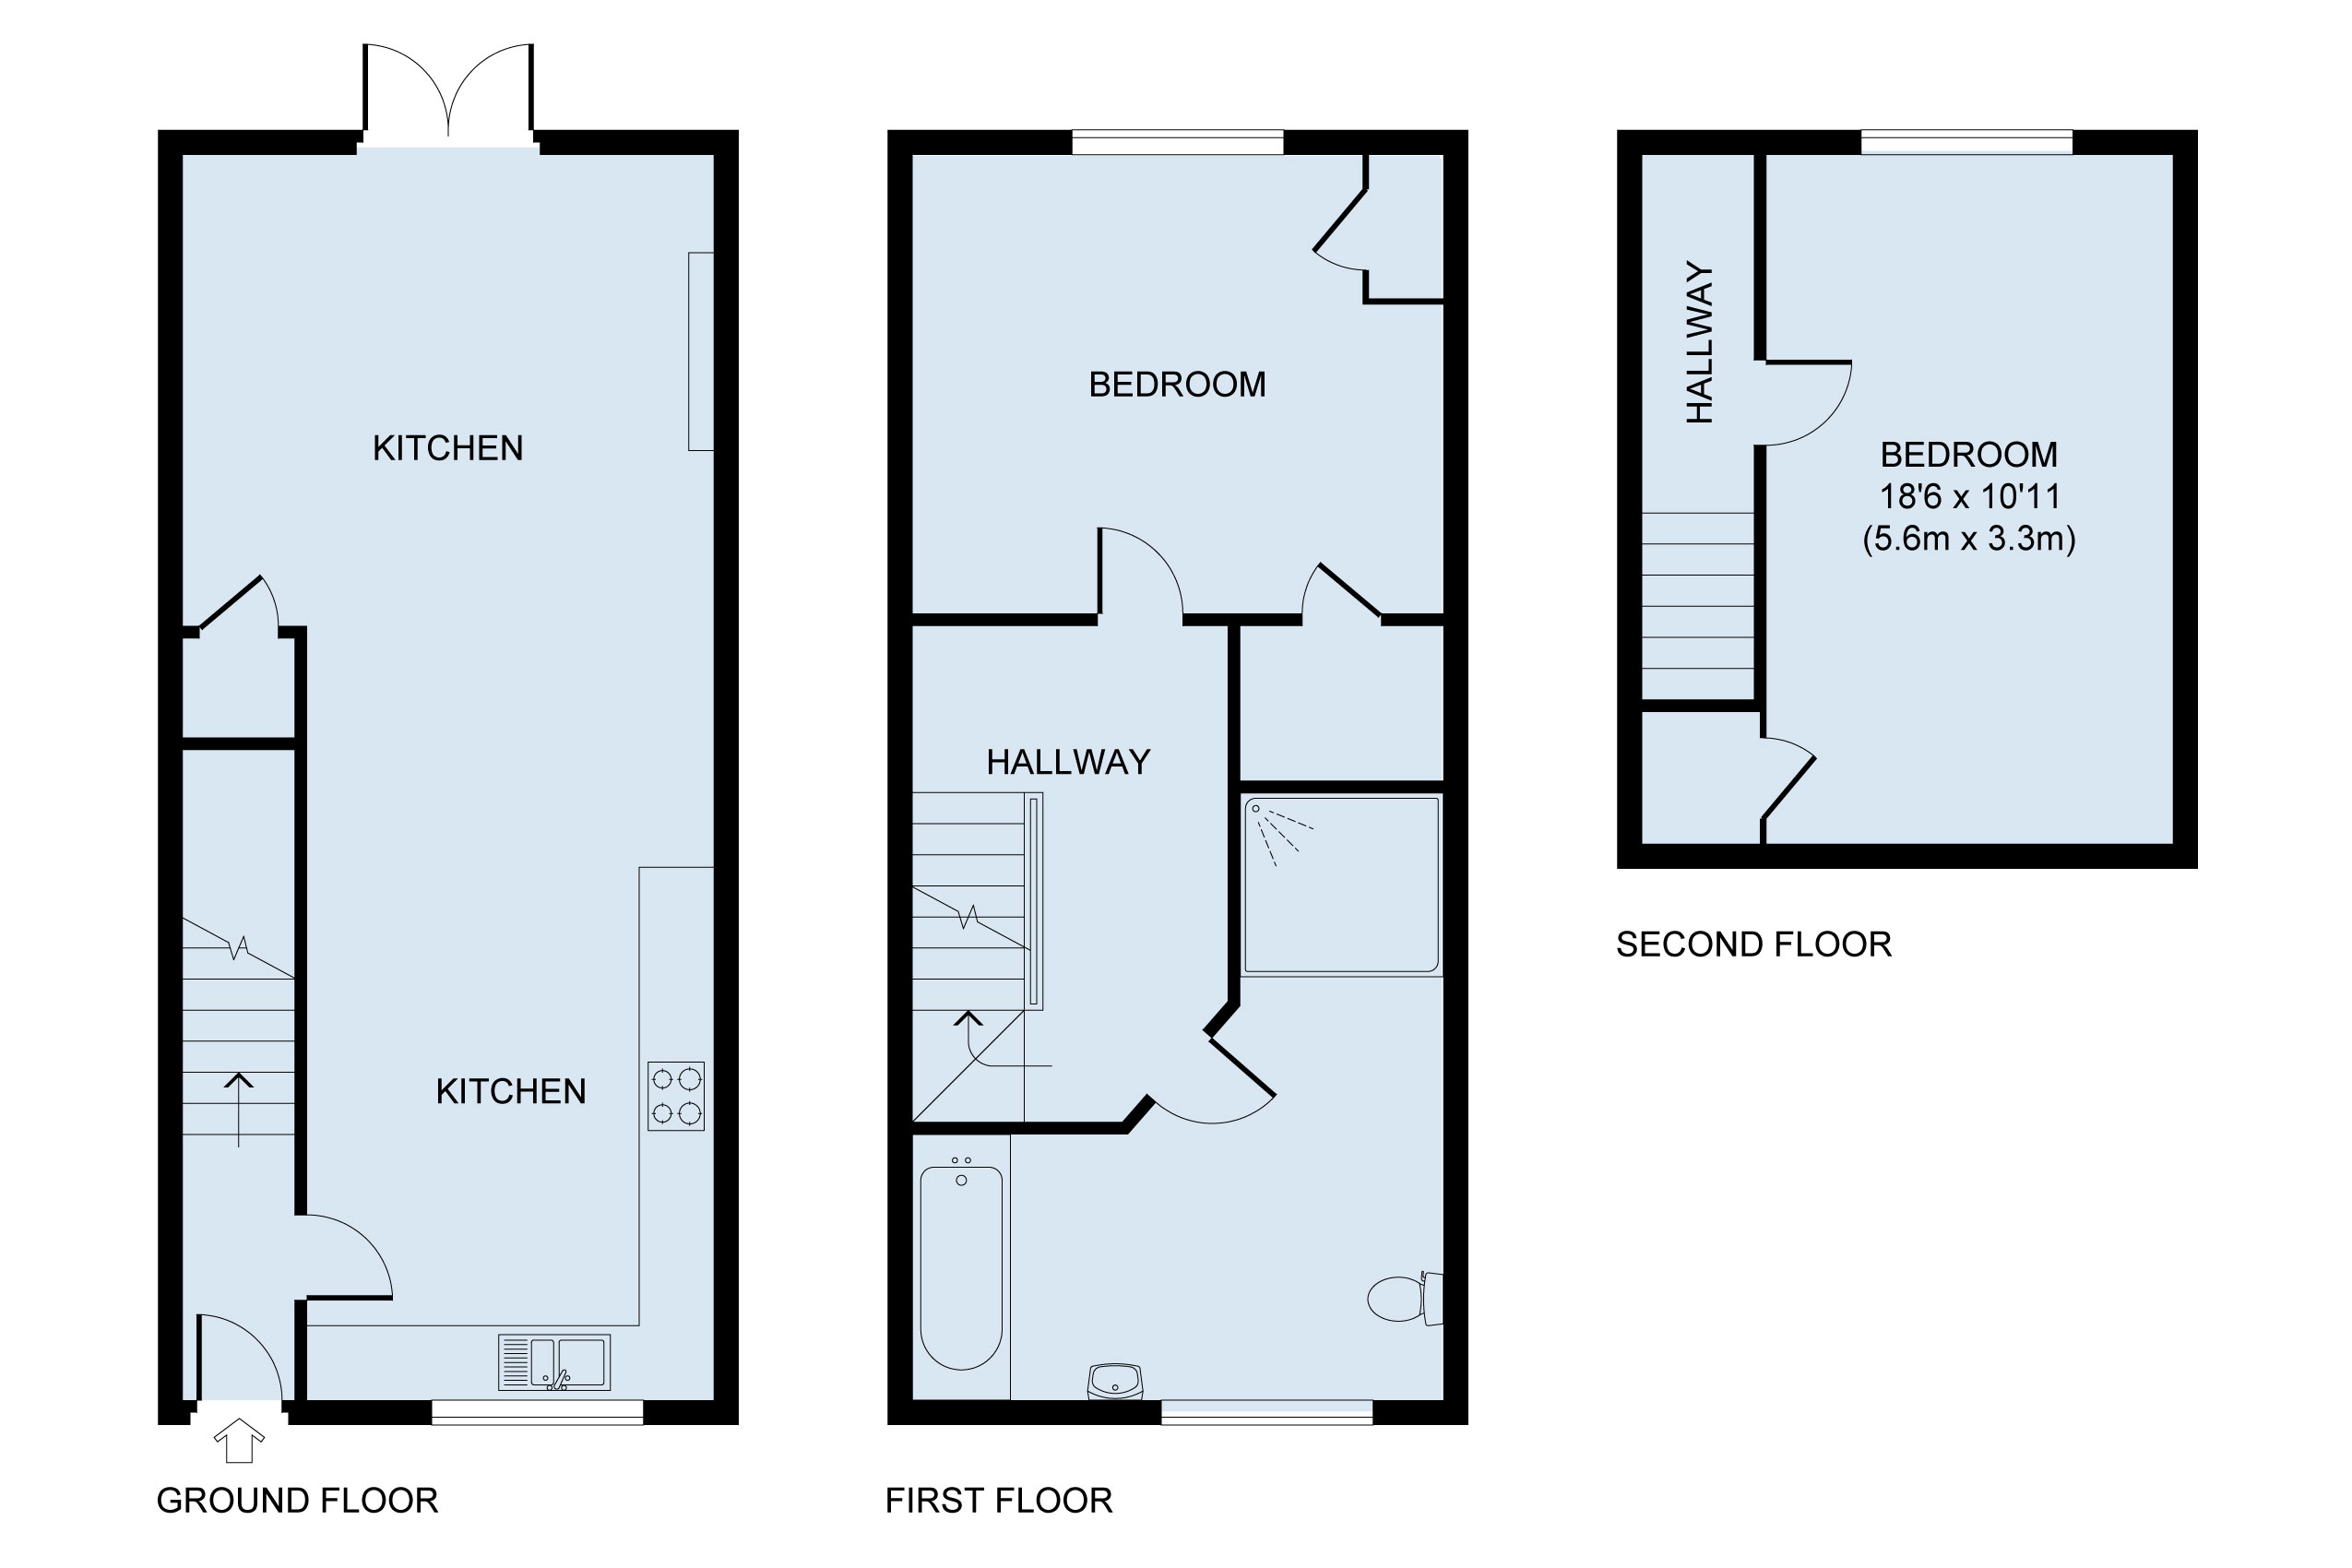 floor plan for The Salts